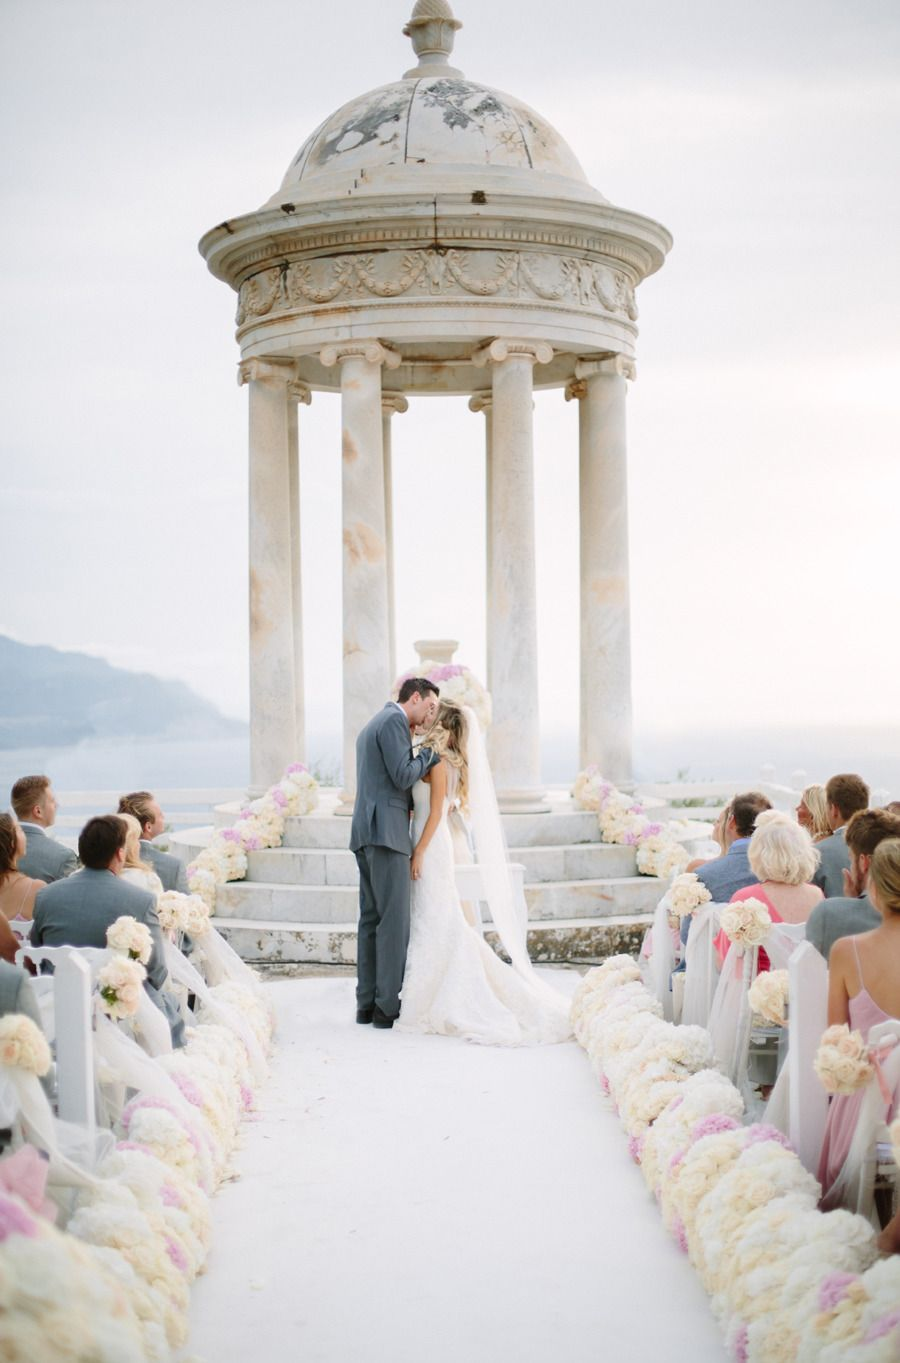 Outdoor summer wedding dresses  Romantic Summer Spanish Wedding  Spanish wedding Destination